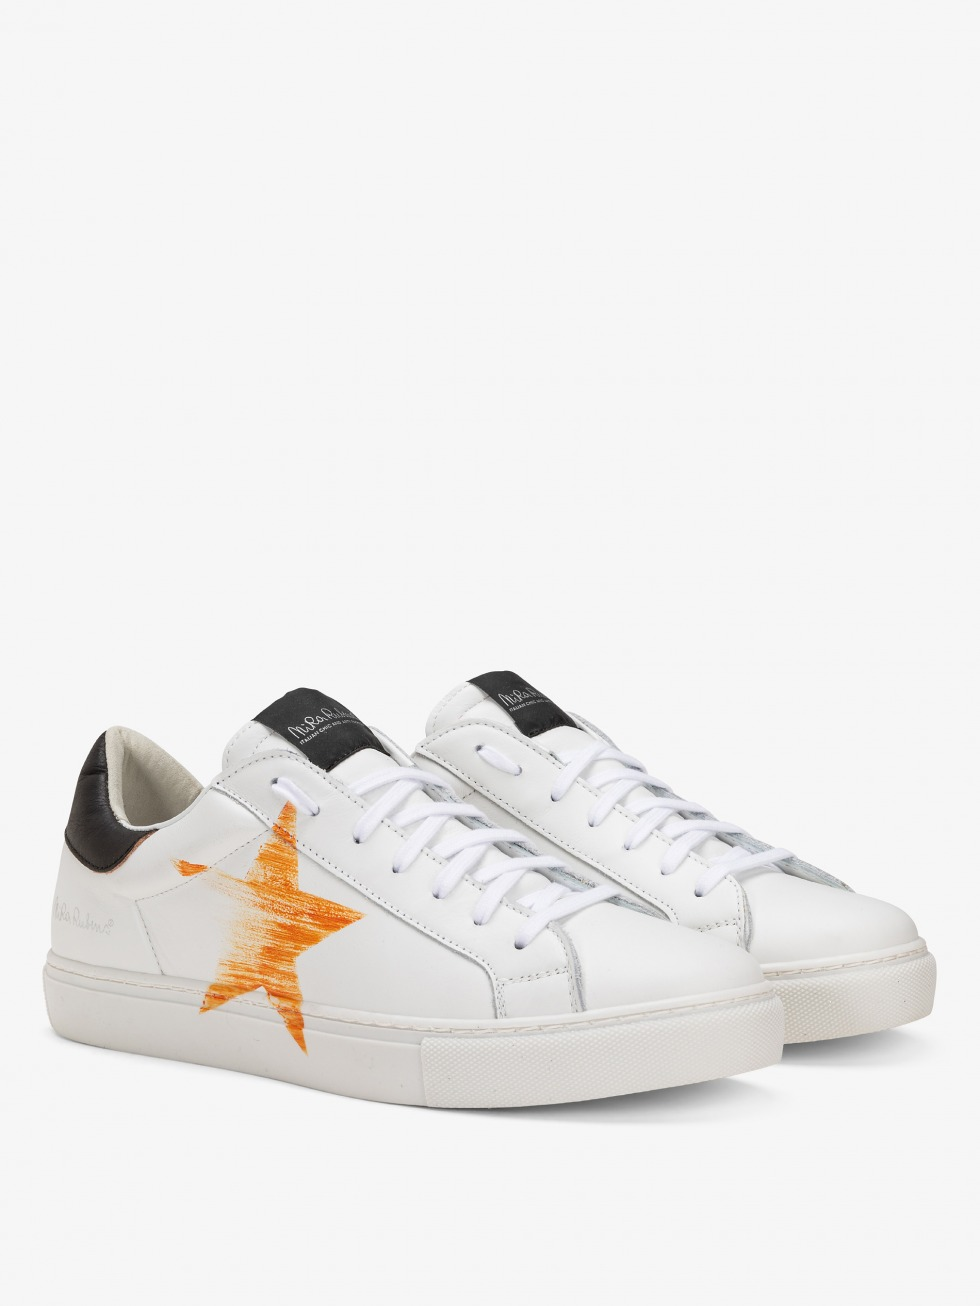 Martini M Sneakers City - Orange Star